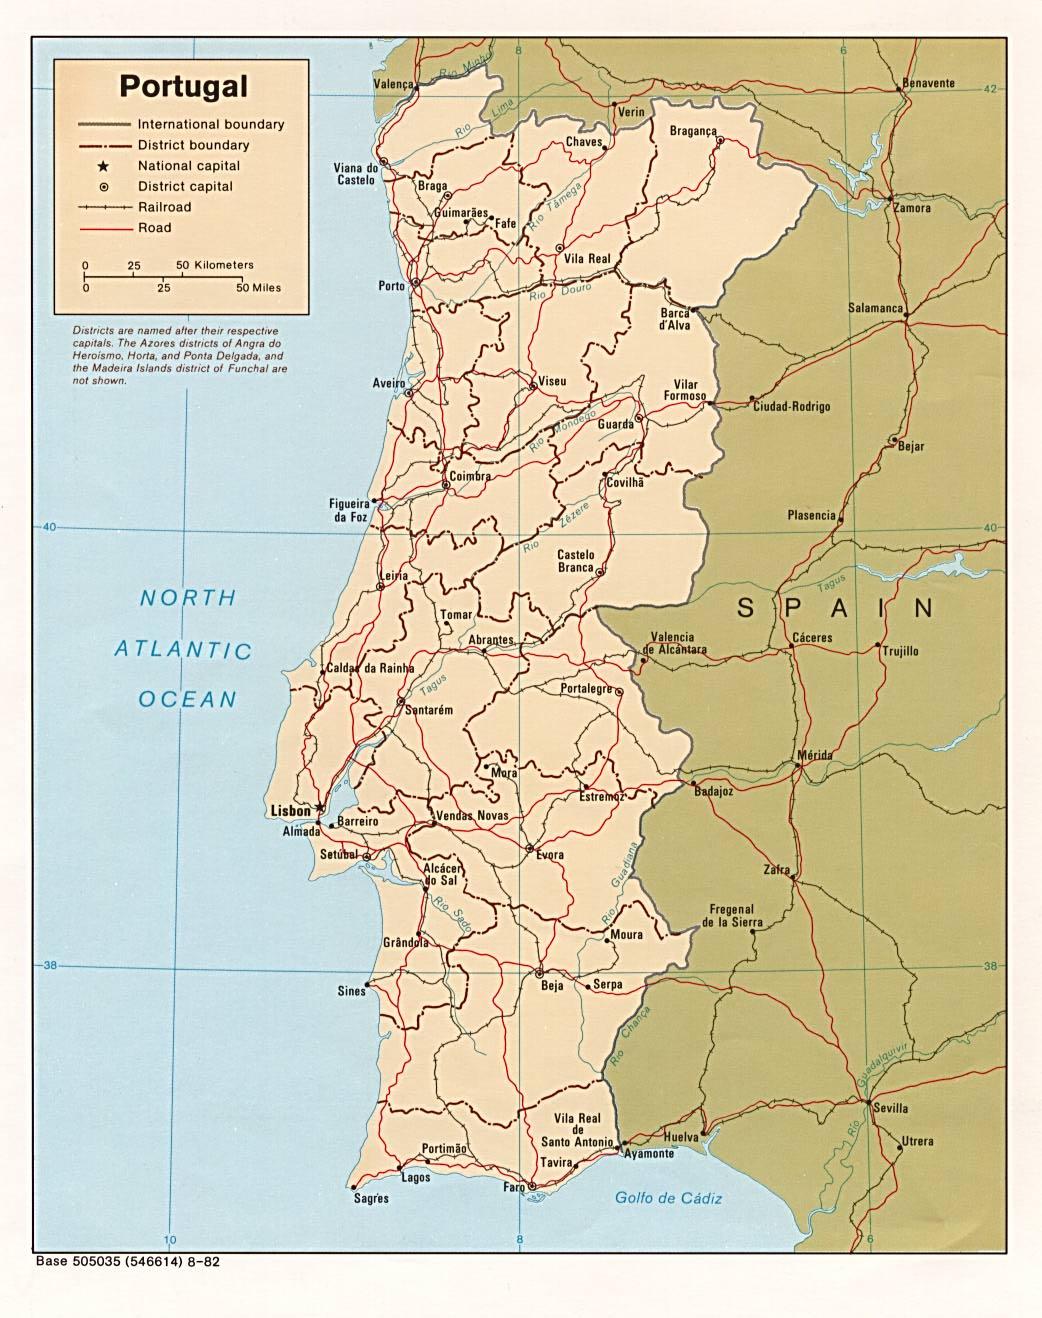 mapa portugal download Download Free Portugal Maps mapa portugal download